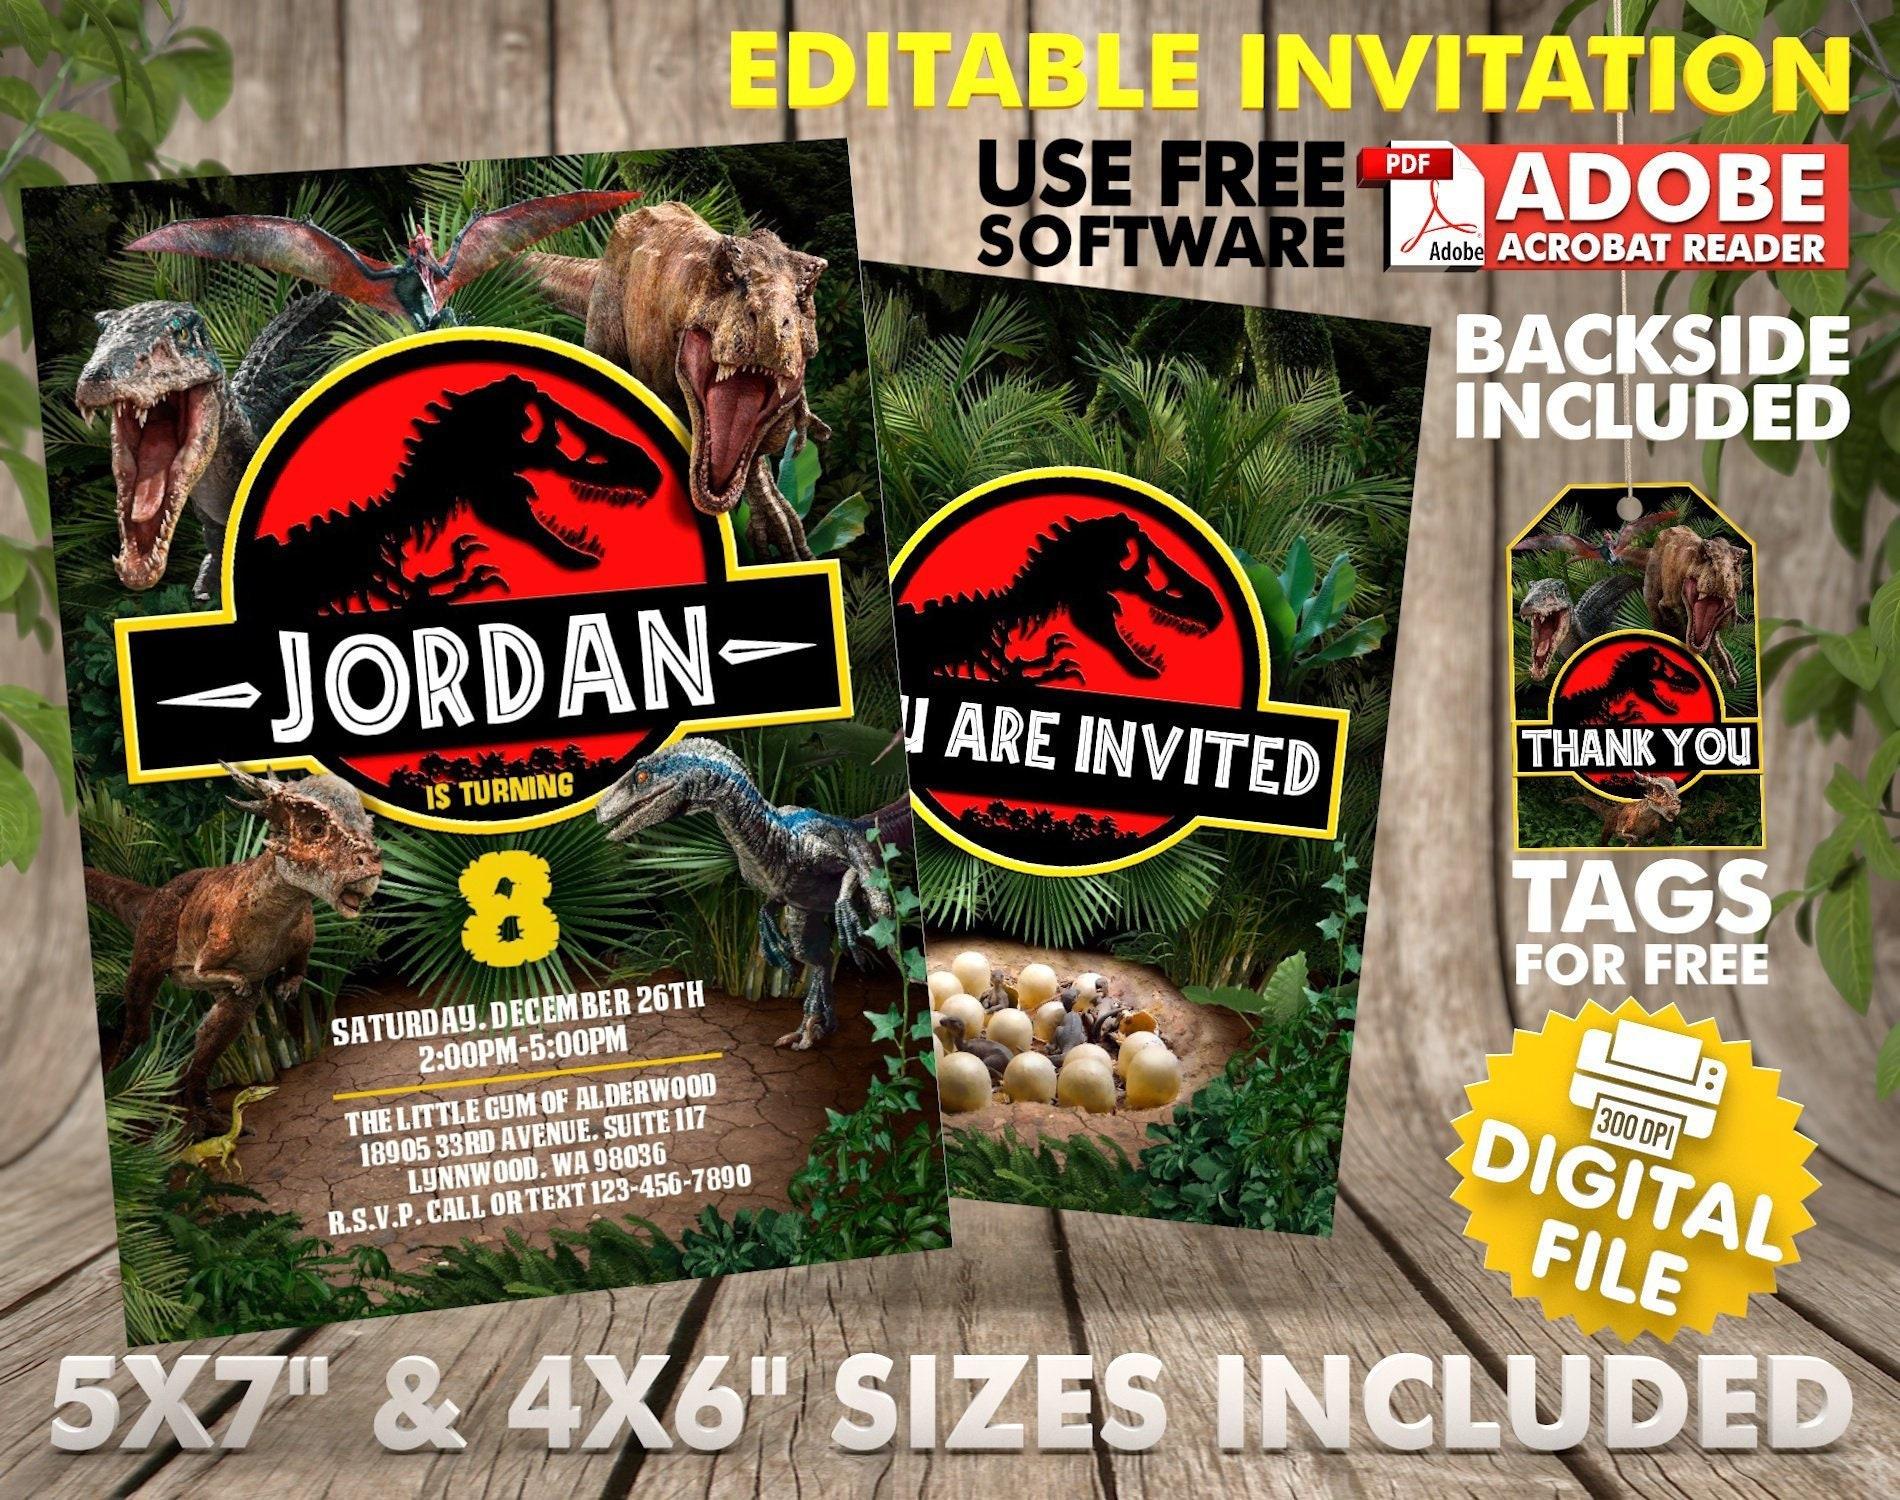 jurassic park 4 movie free download english